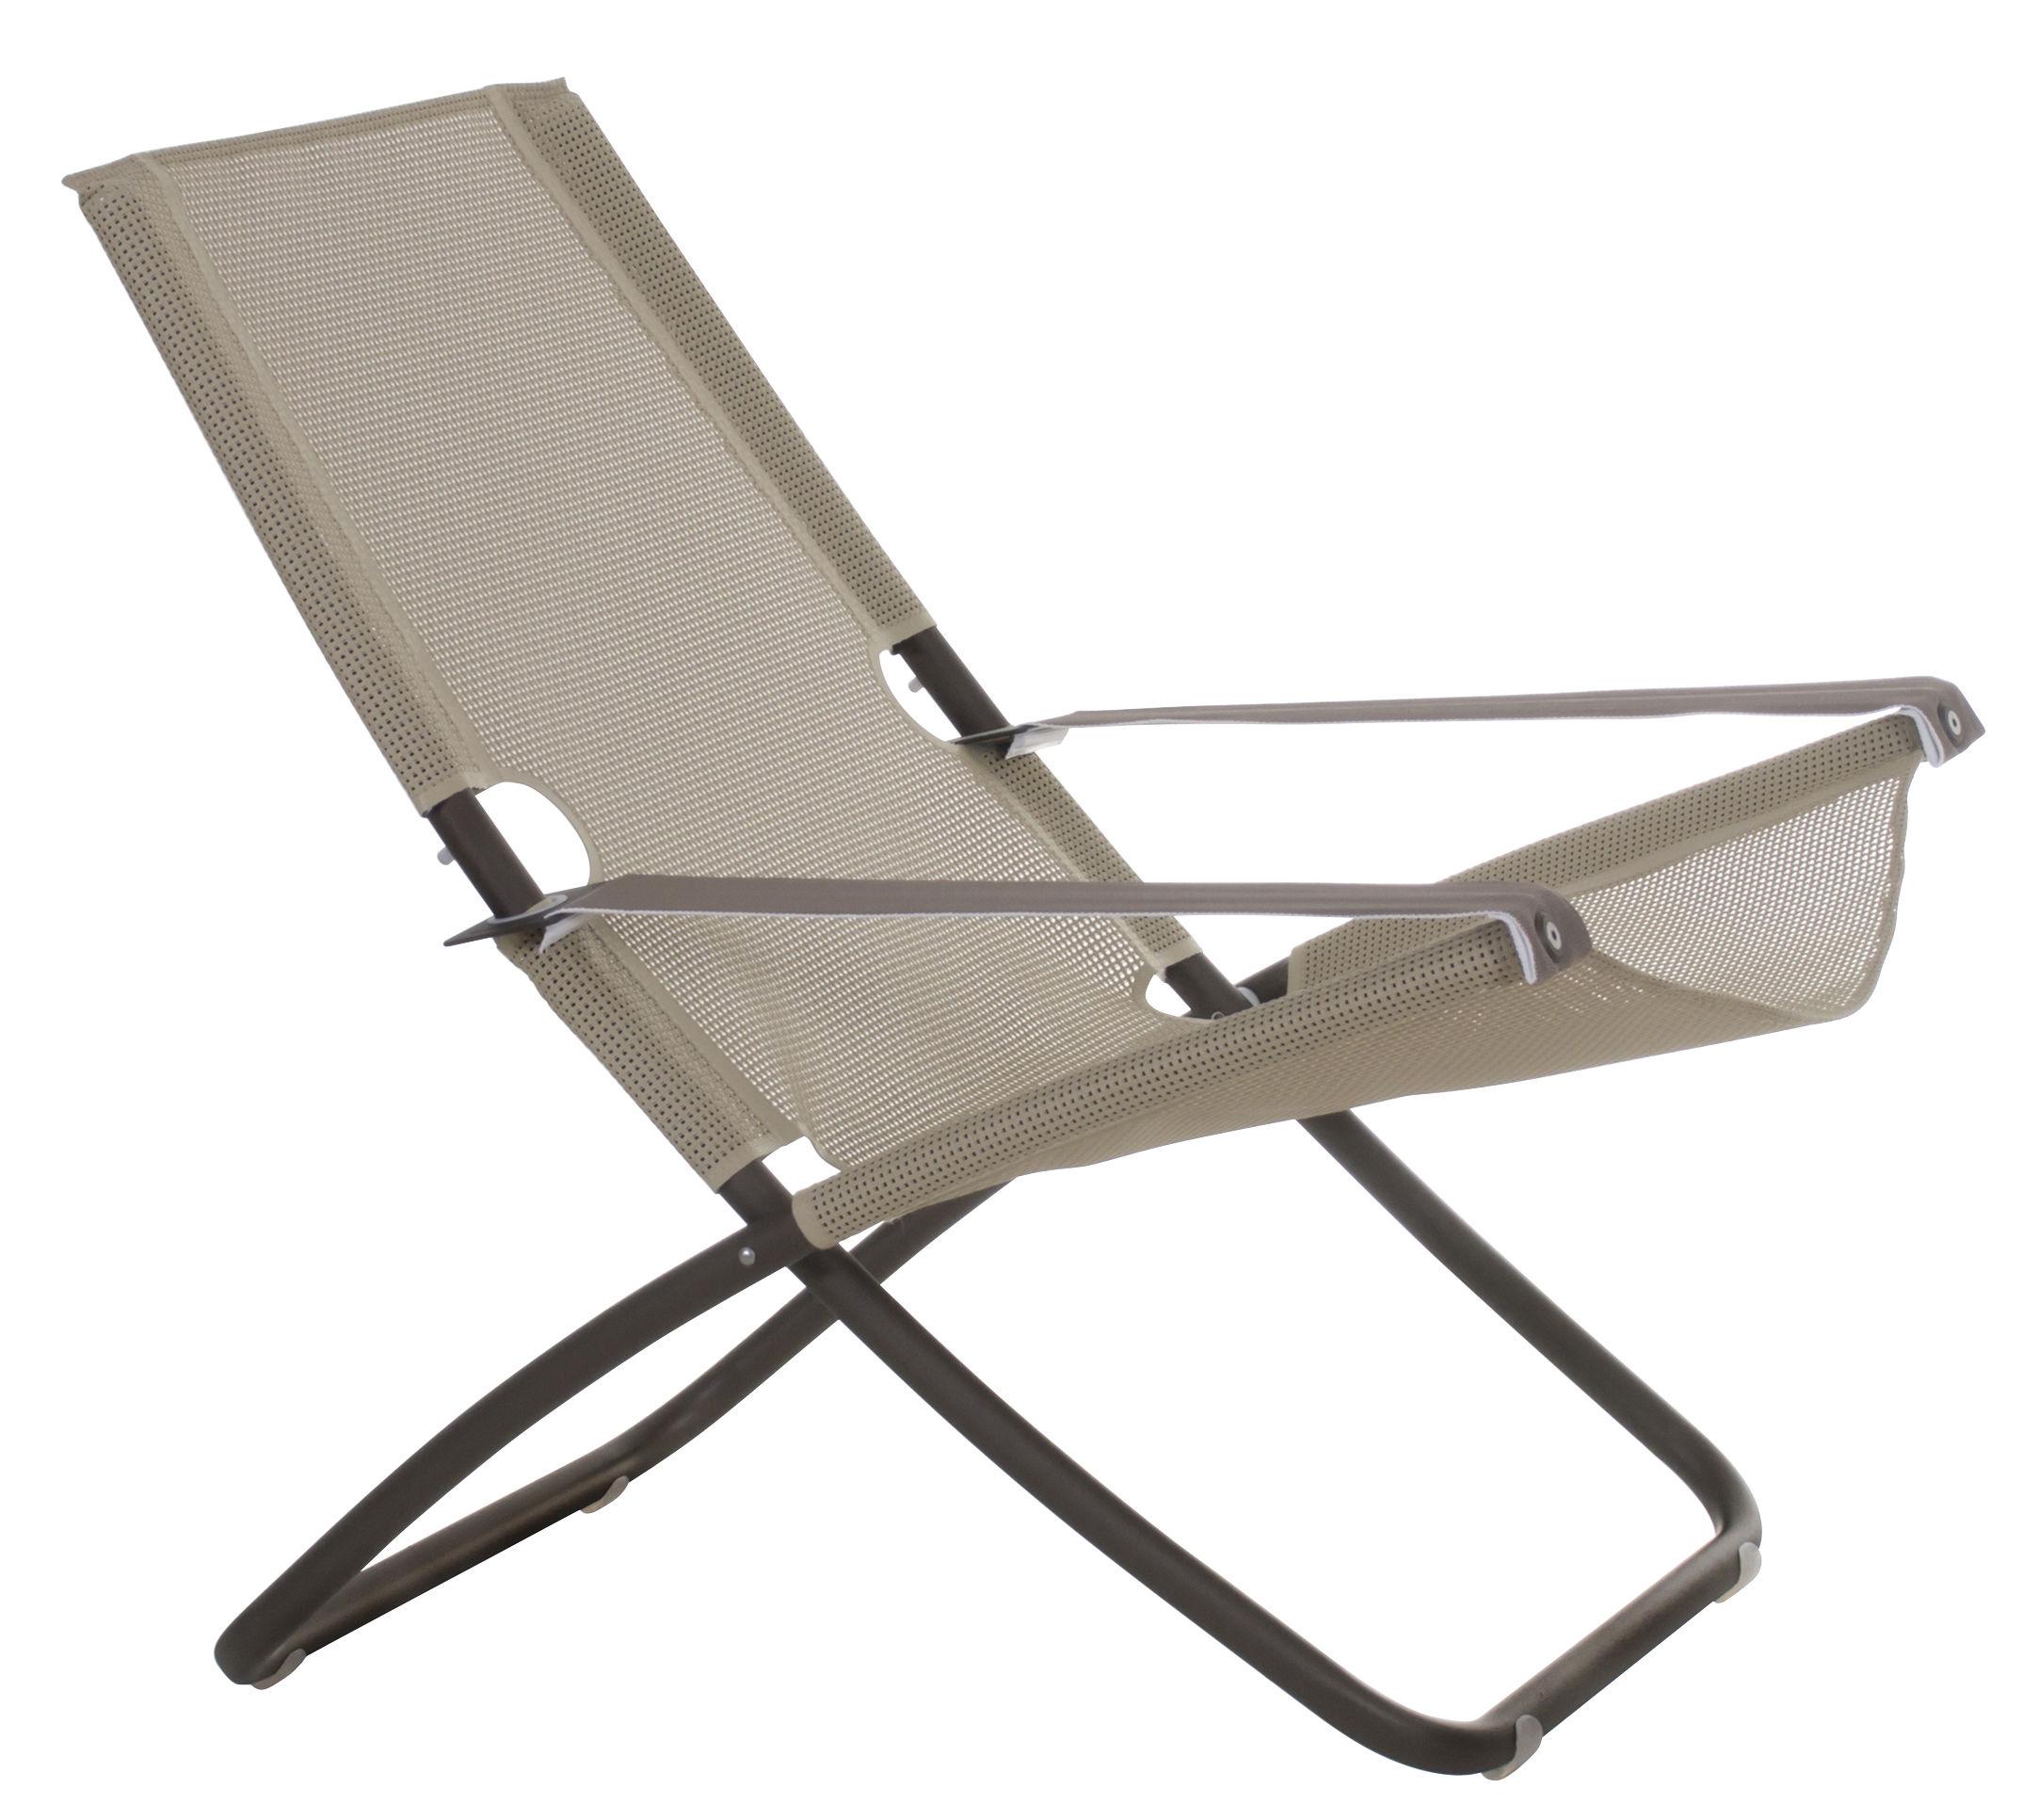 Chaise longue snooze bronze emu for Chaise longue pour bronzer